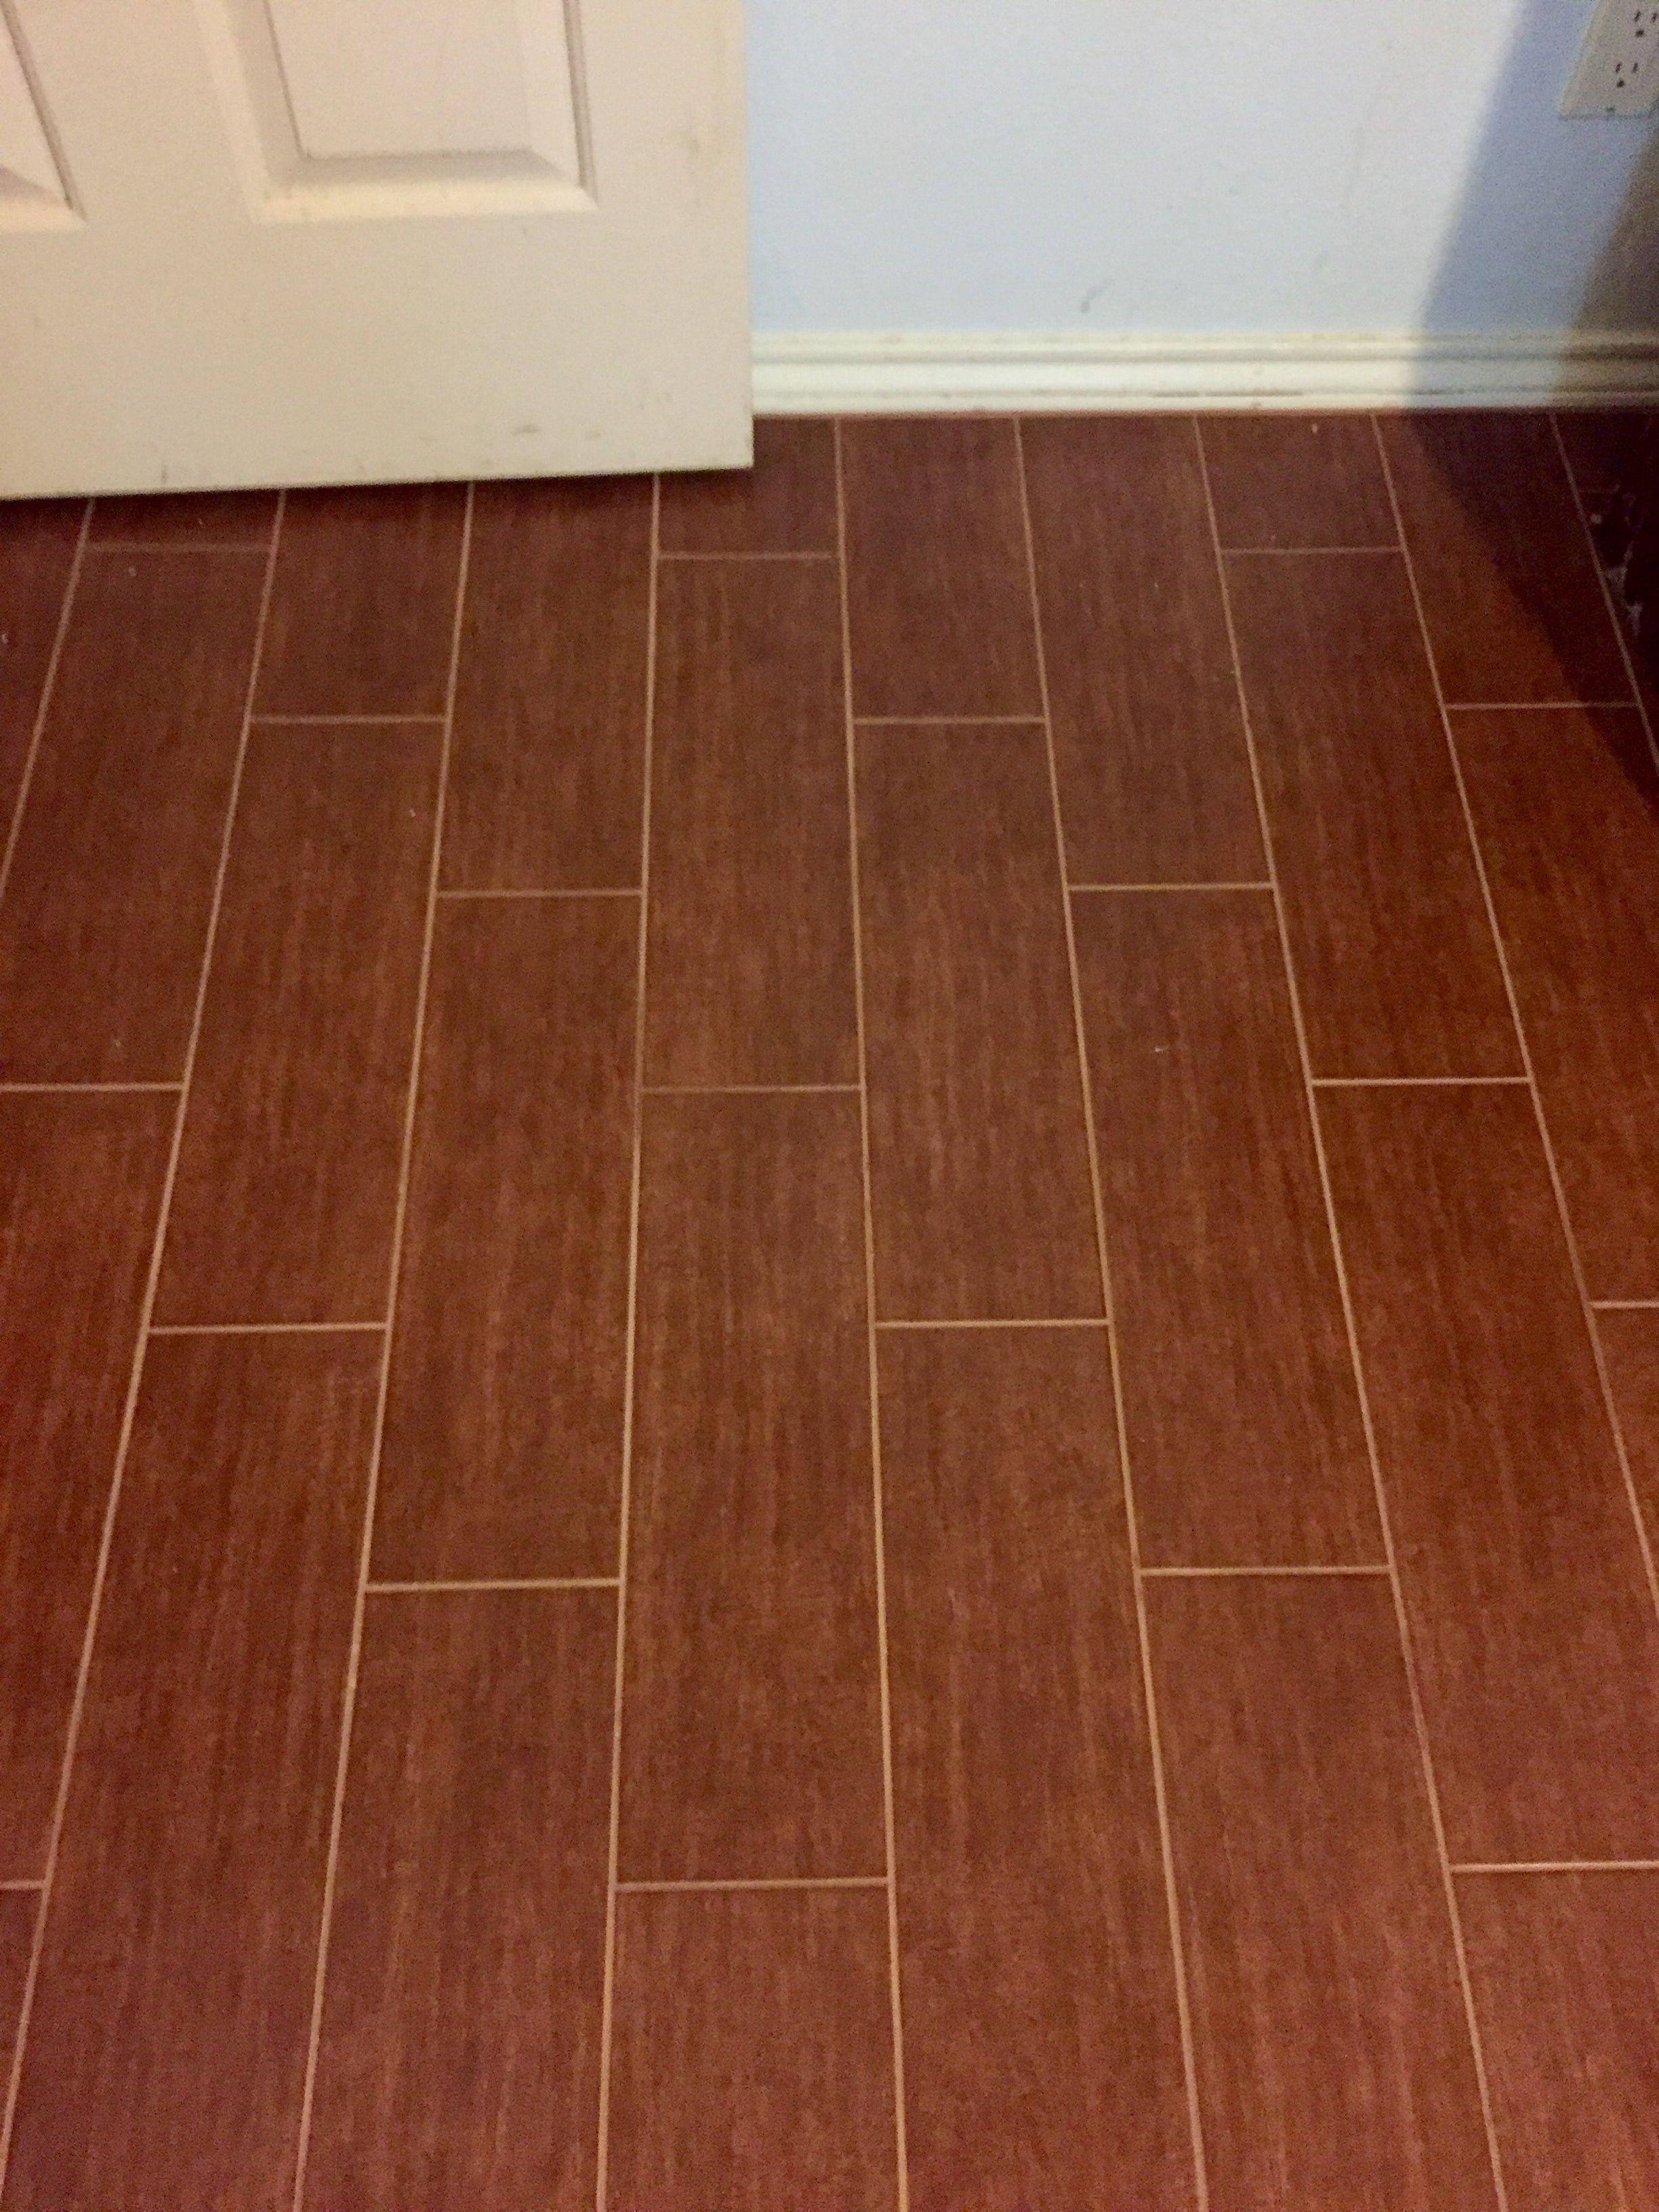 room st dream manatee james kx pad floors scene flooring can c mahogany laminate home hills rs